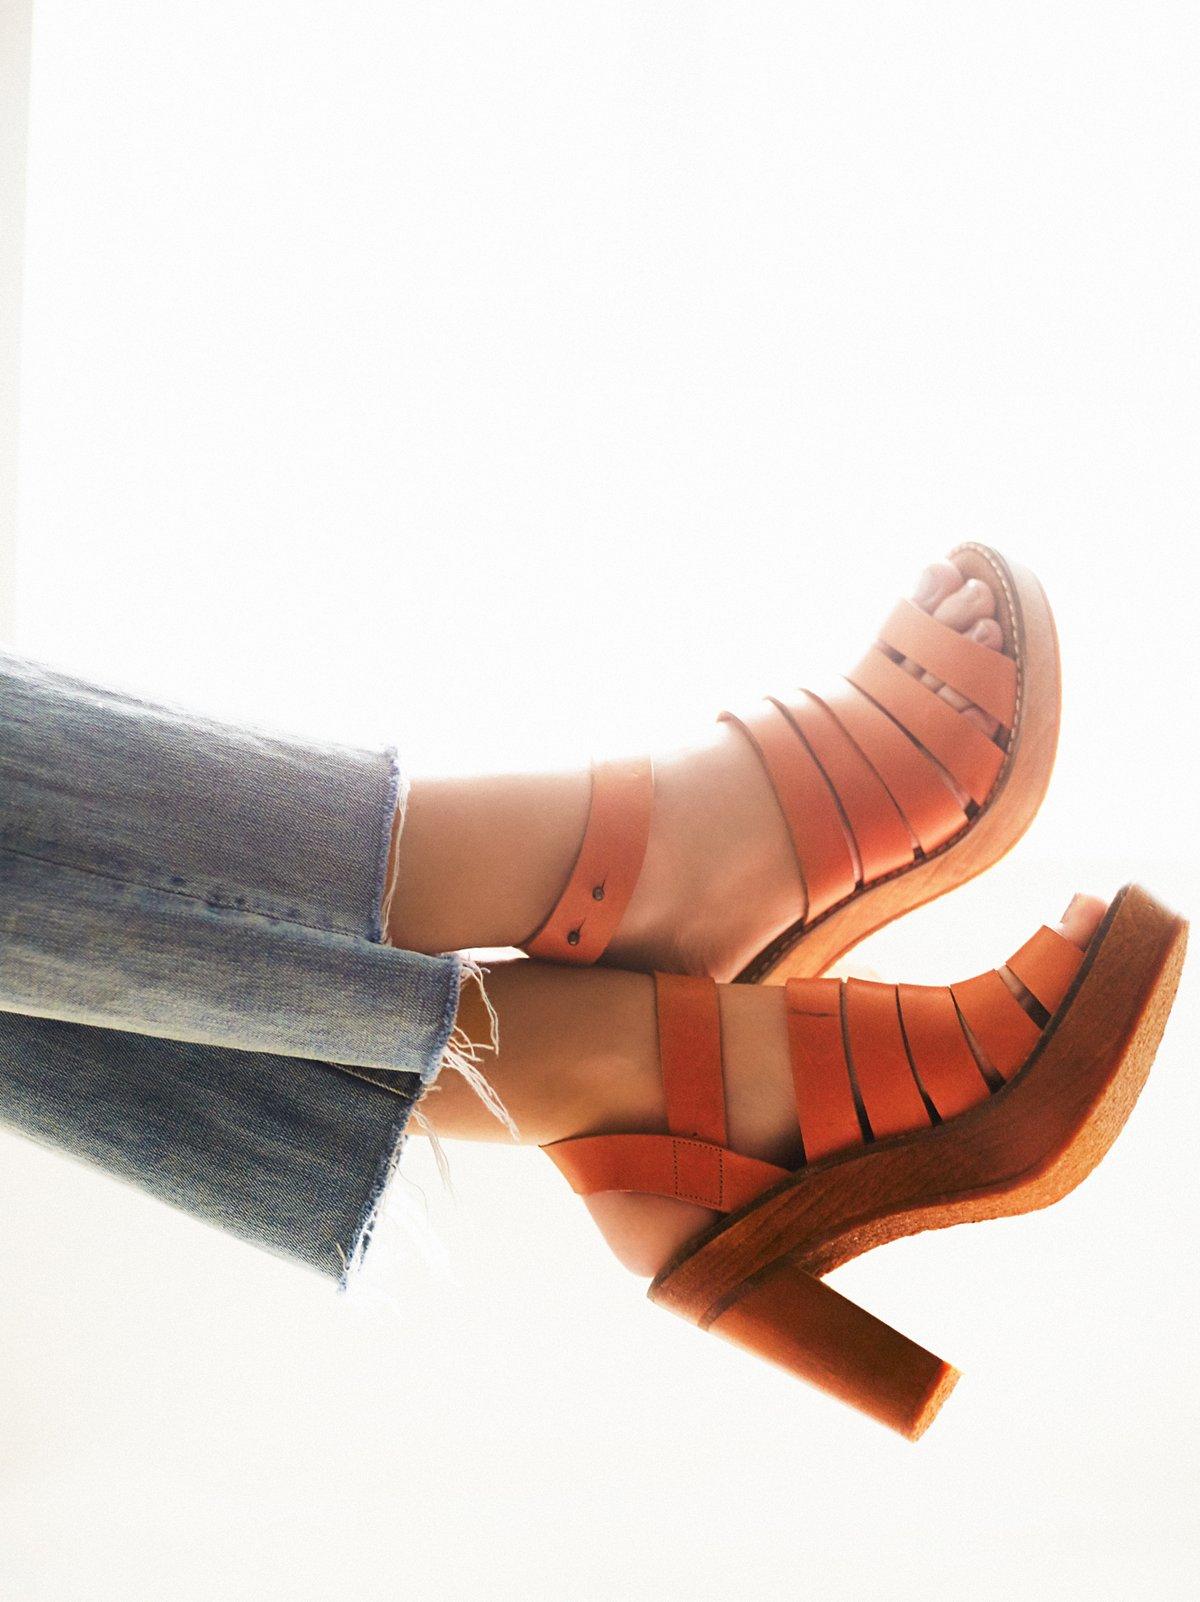 New Dule厚底高跟鞋